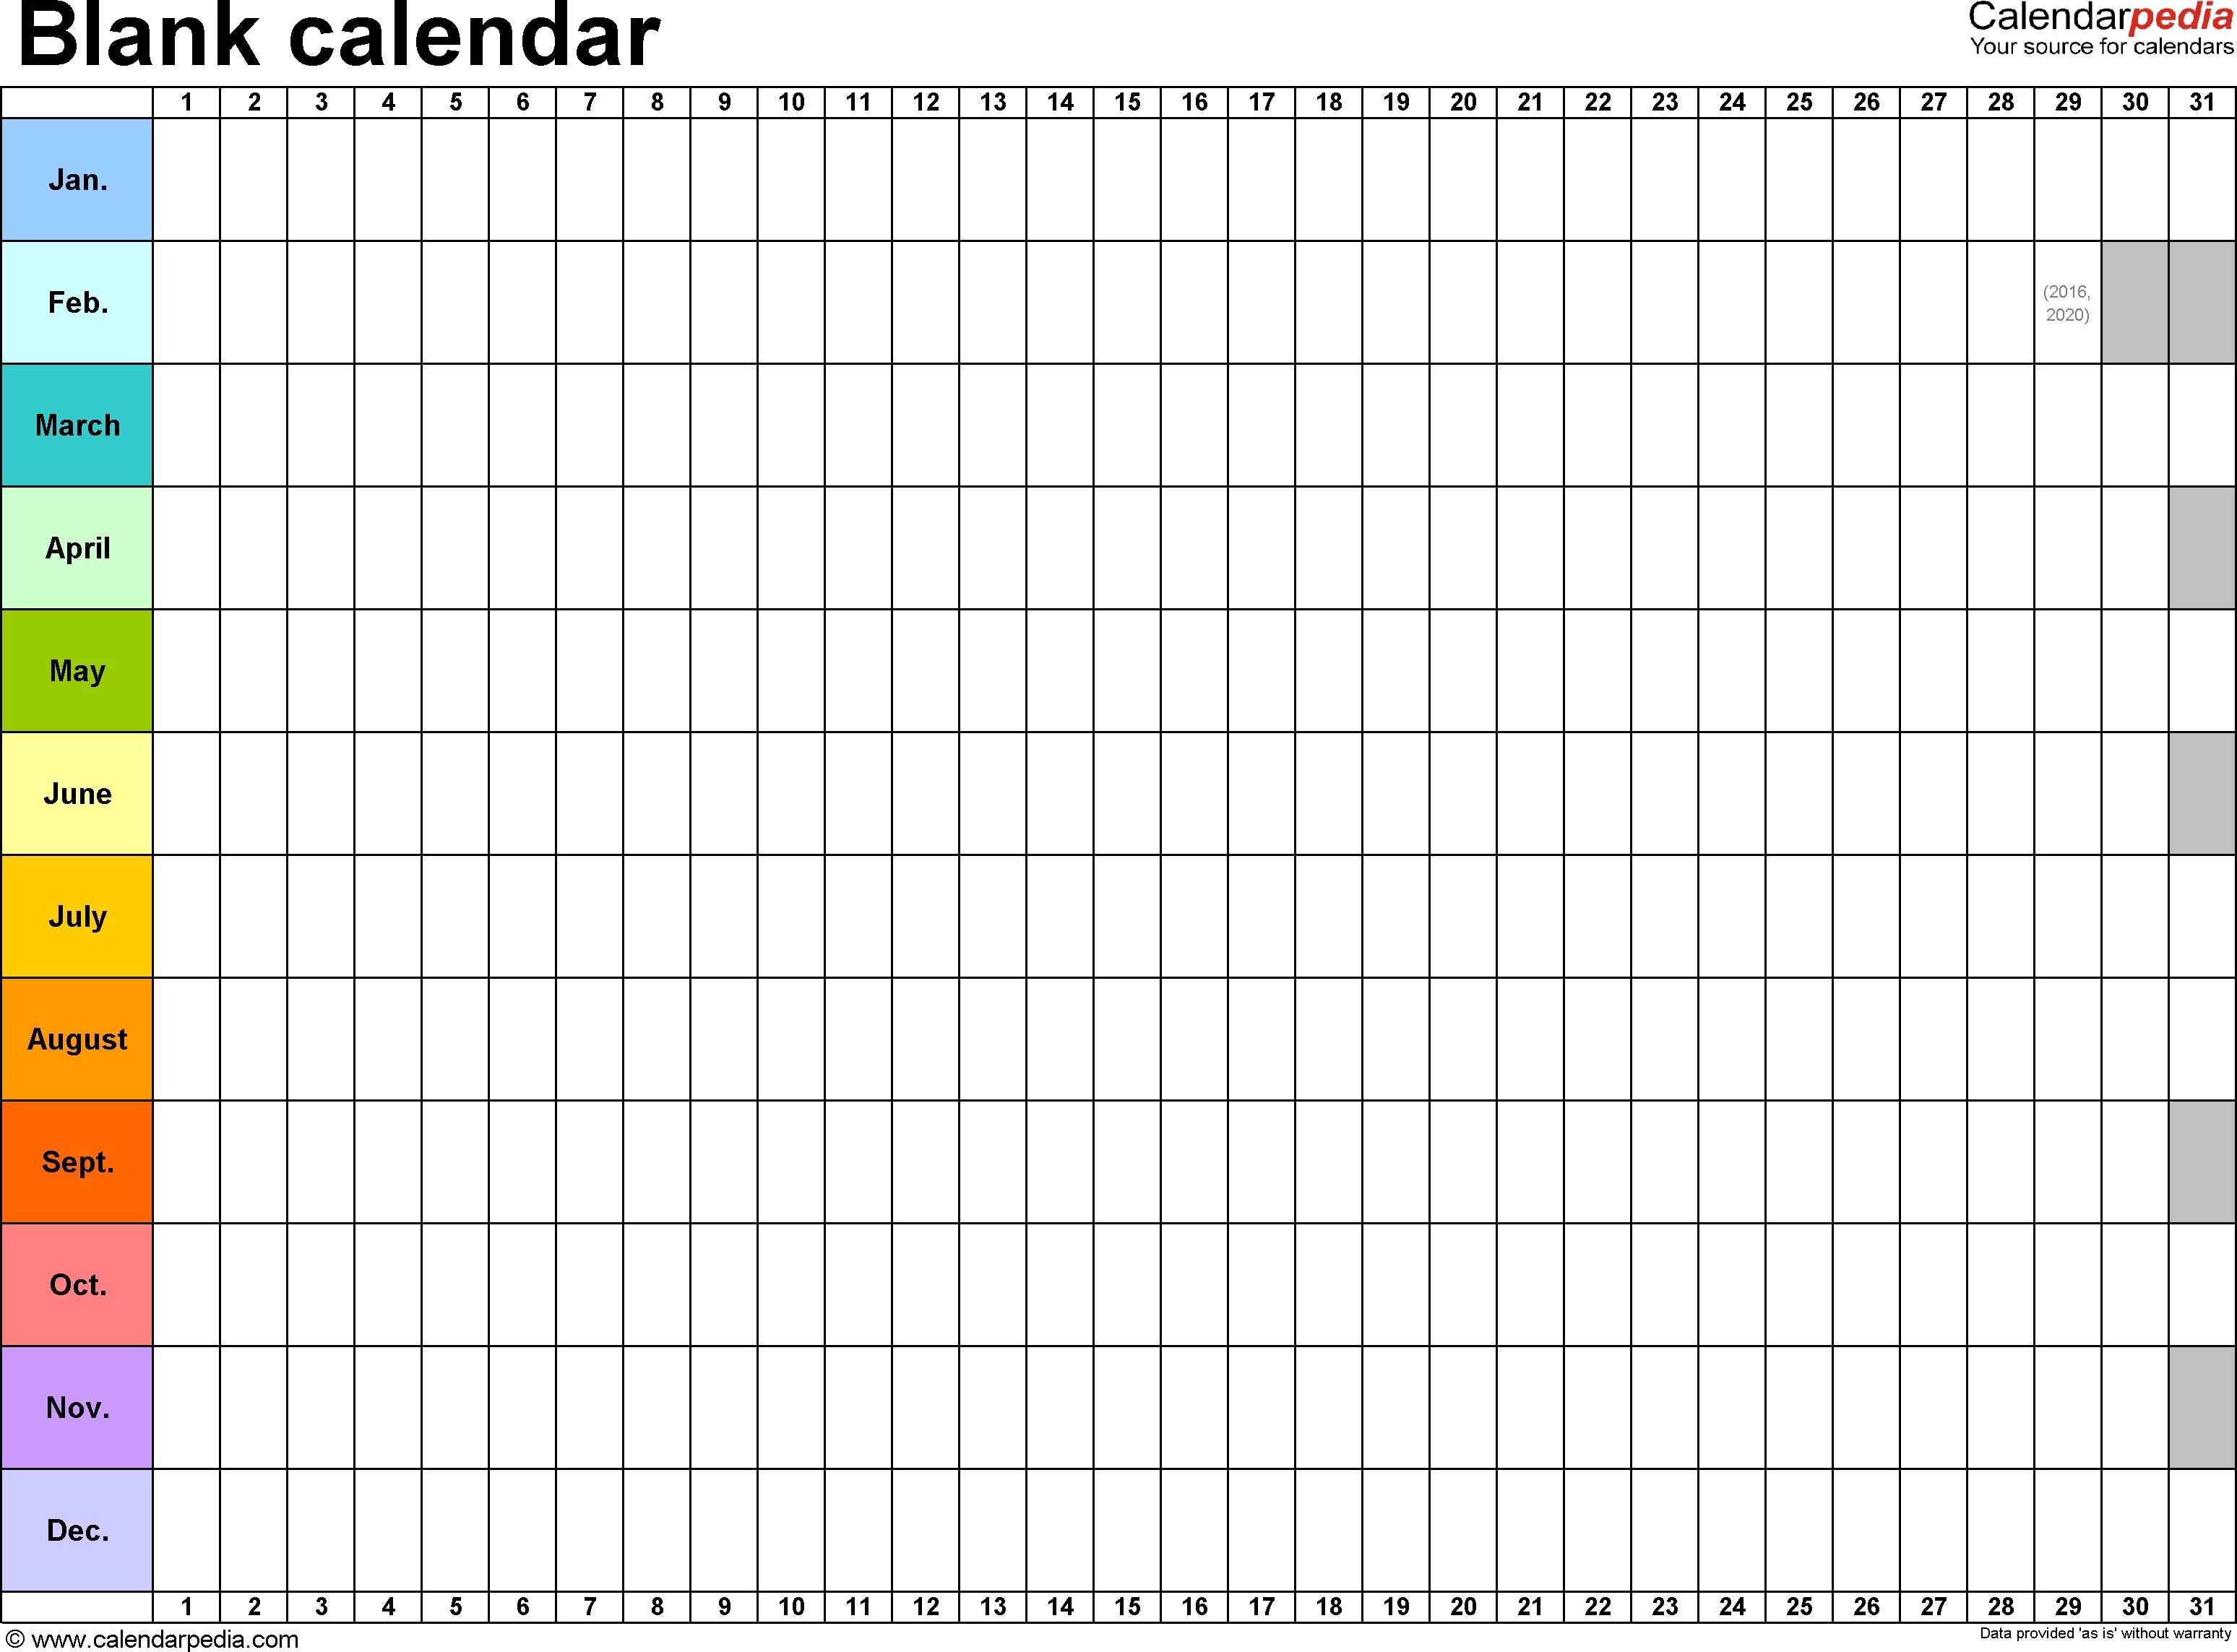 Blank Calendar - 9 Free Printable Microsoft Word Templates inside 3 Month Printable Calendar Online